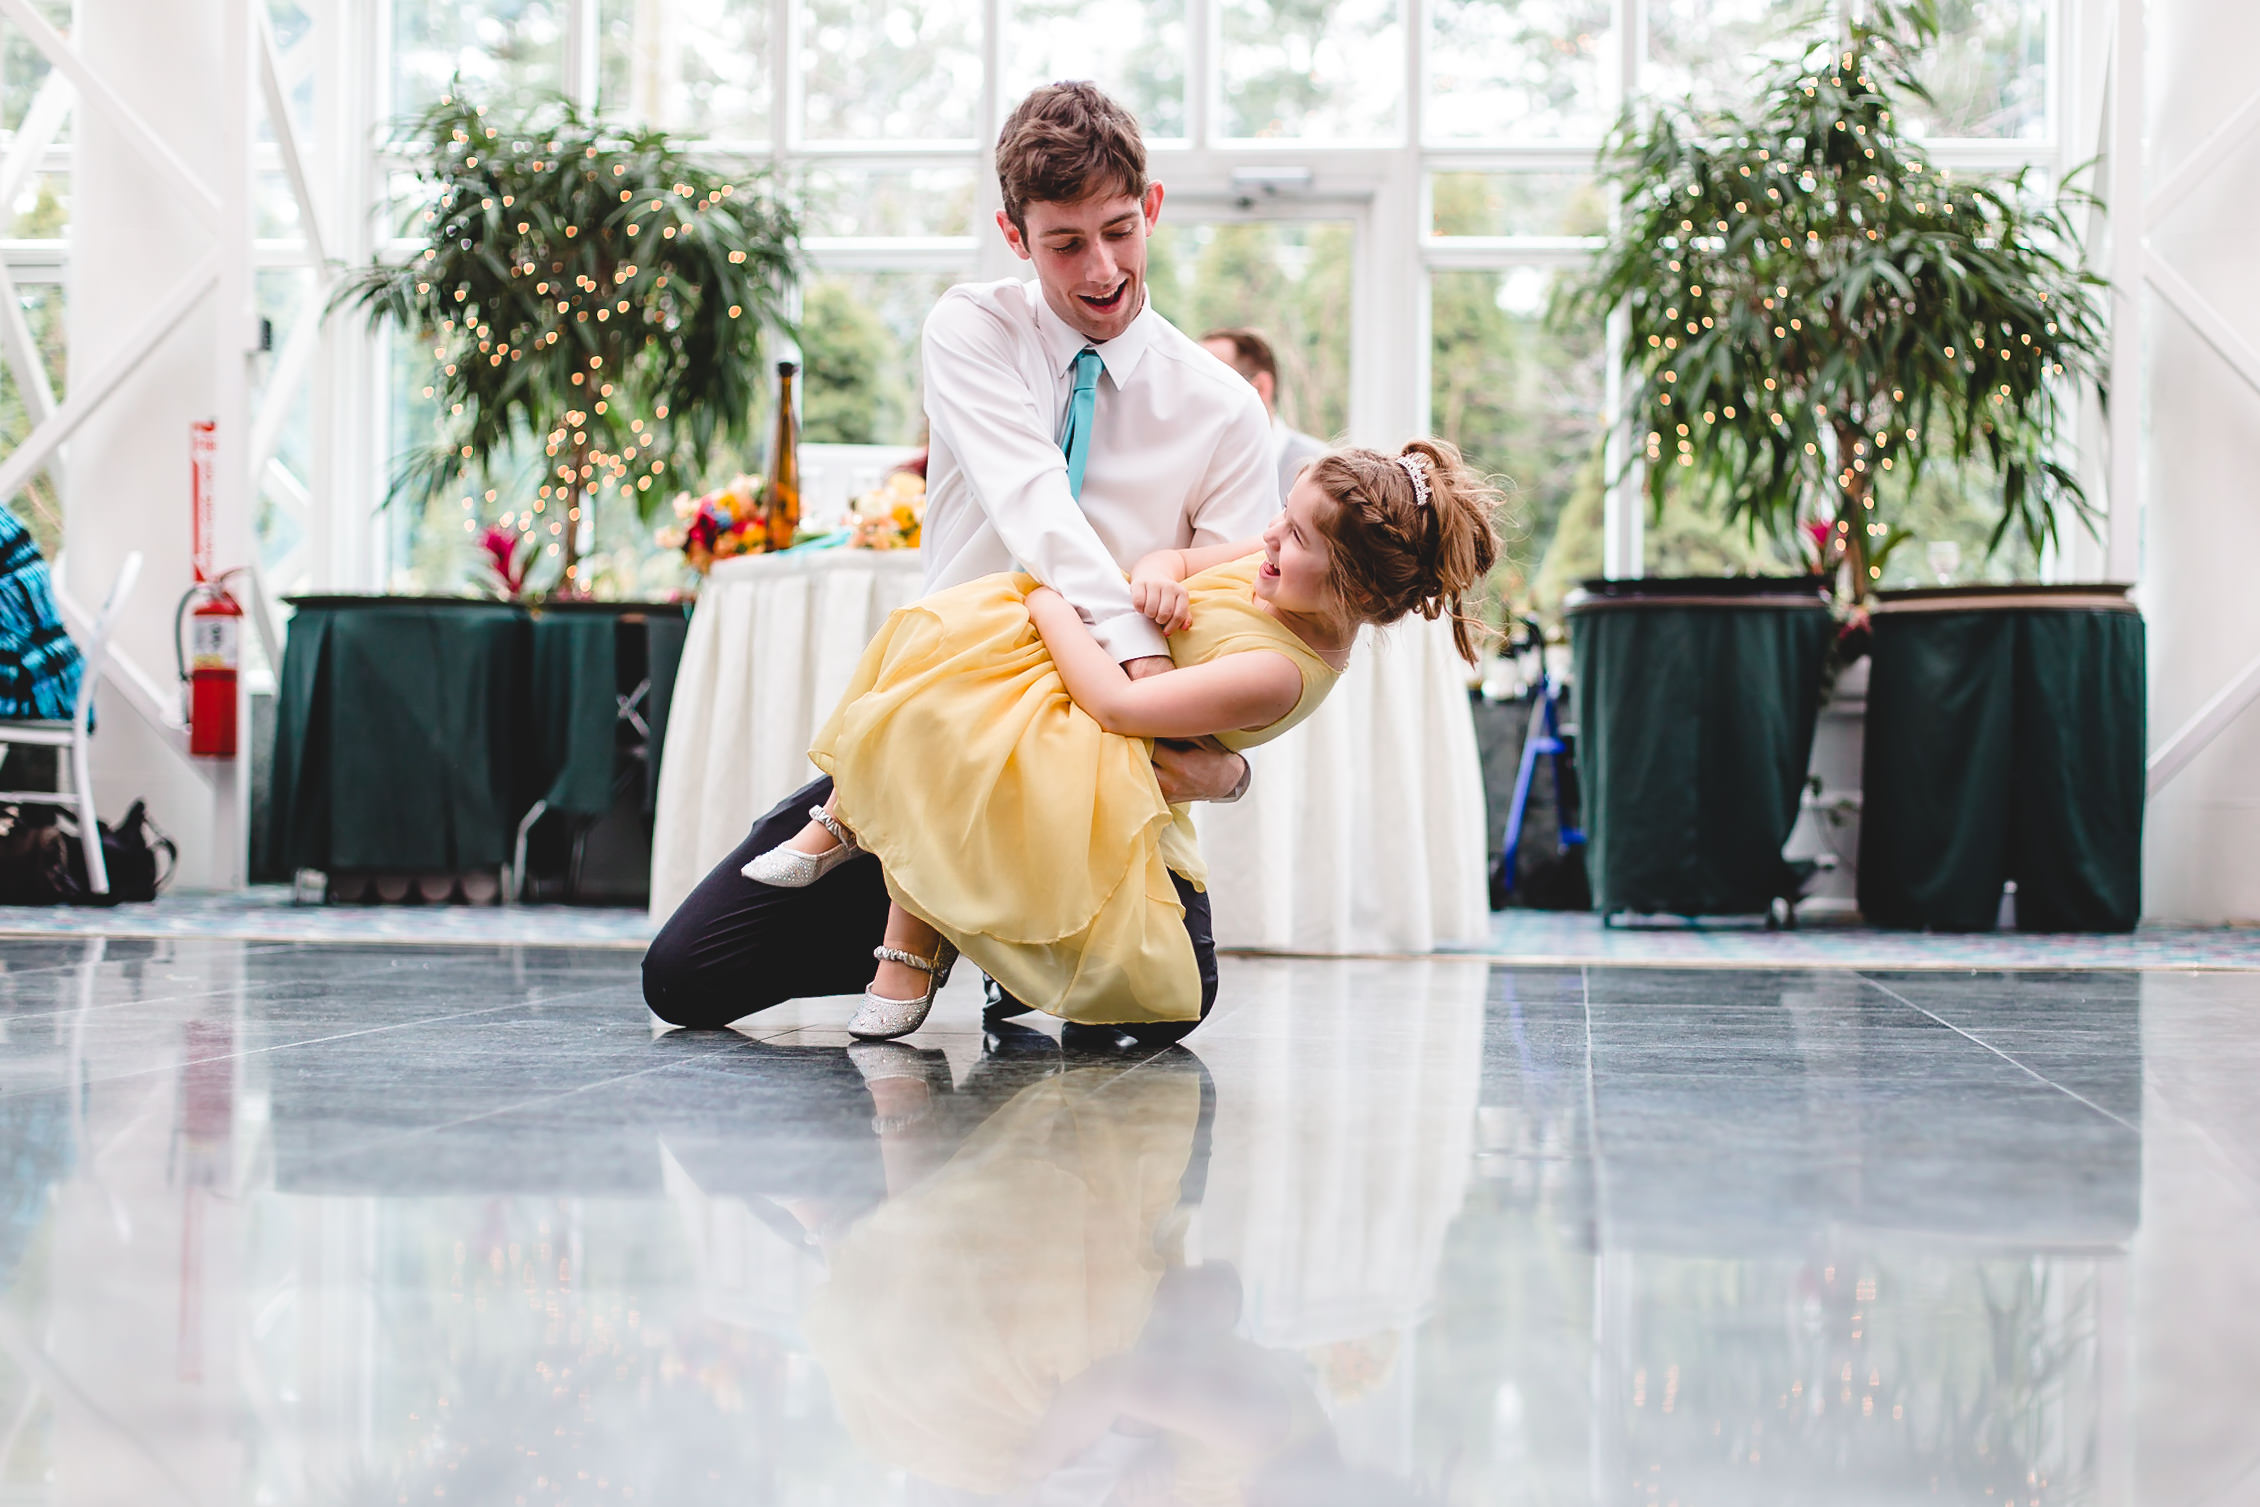 daniel_nydick_nj_photographer_headshot_wedding_event_family-37.jpg